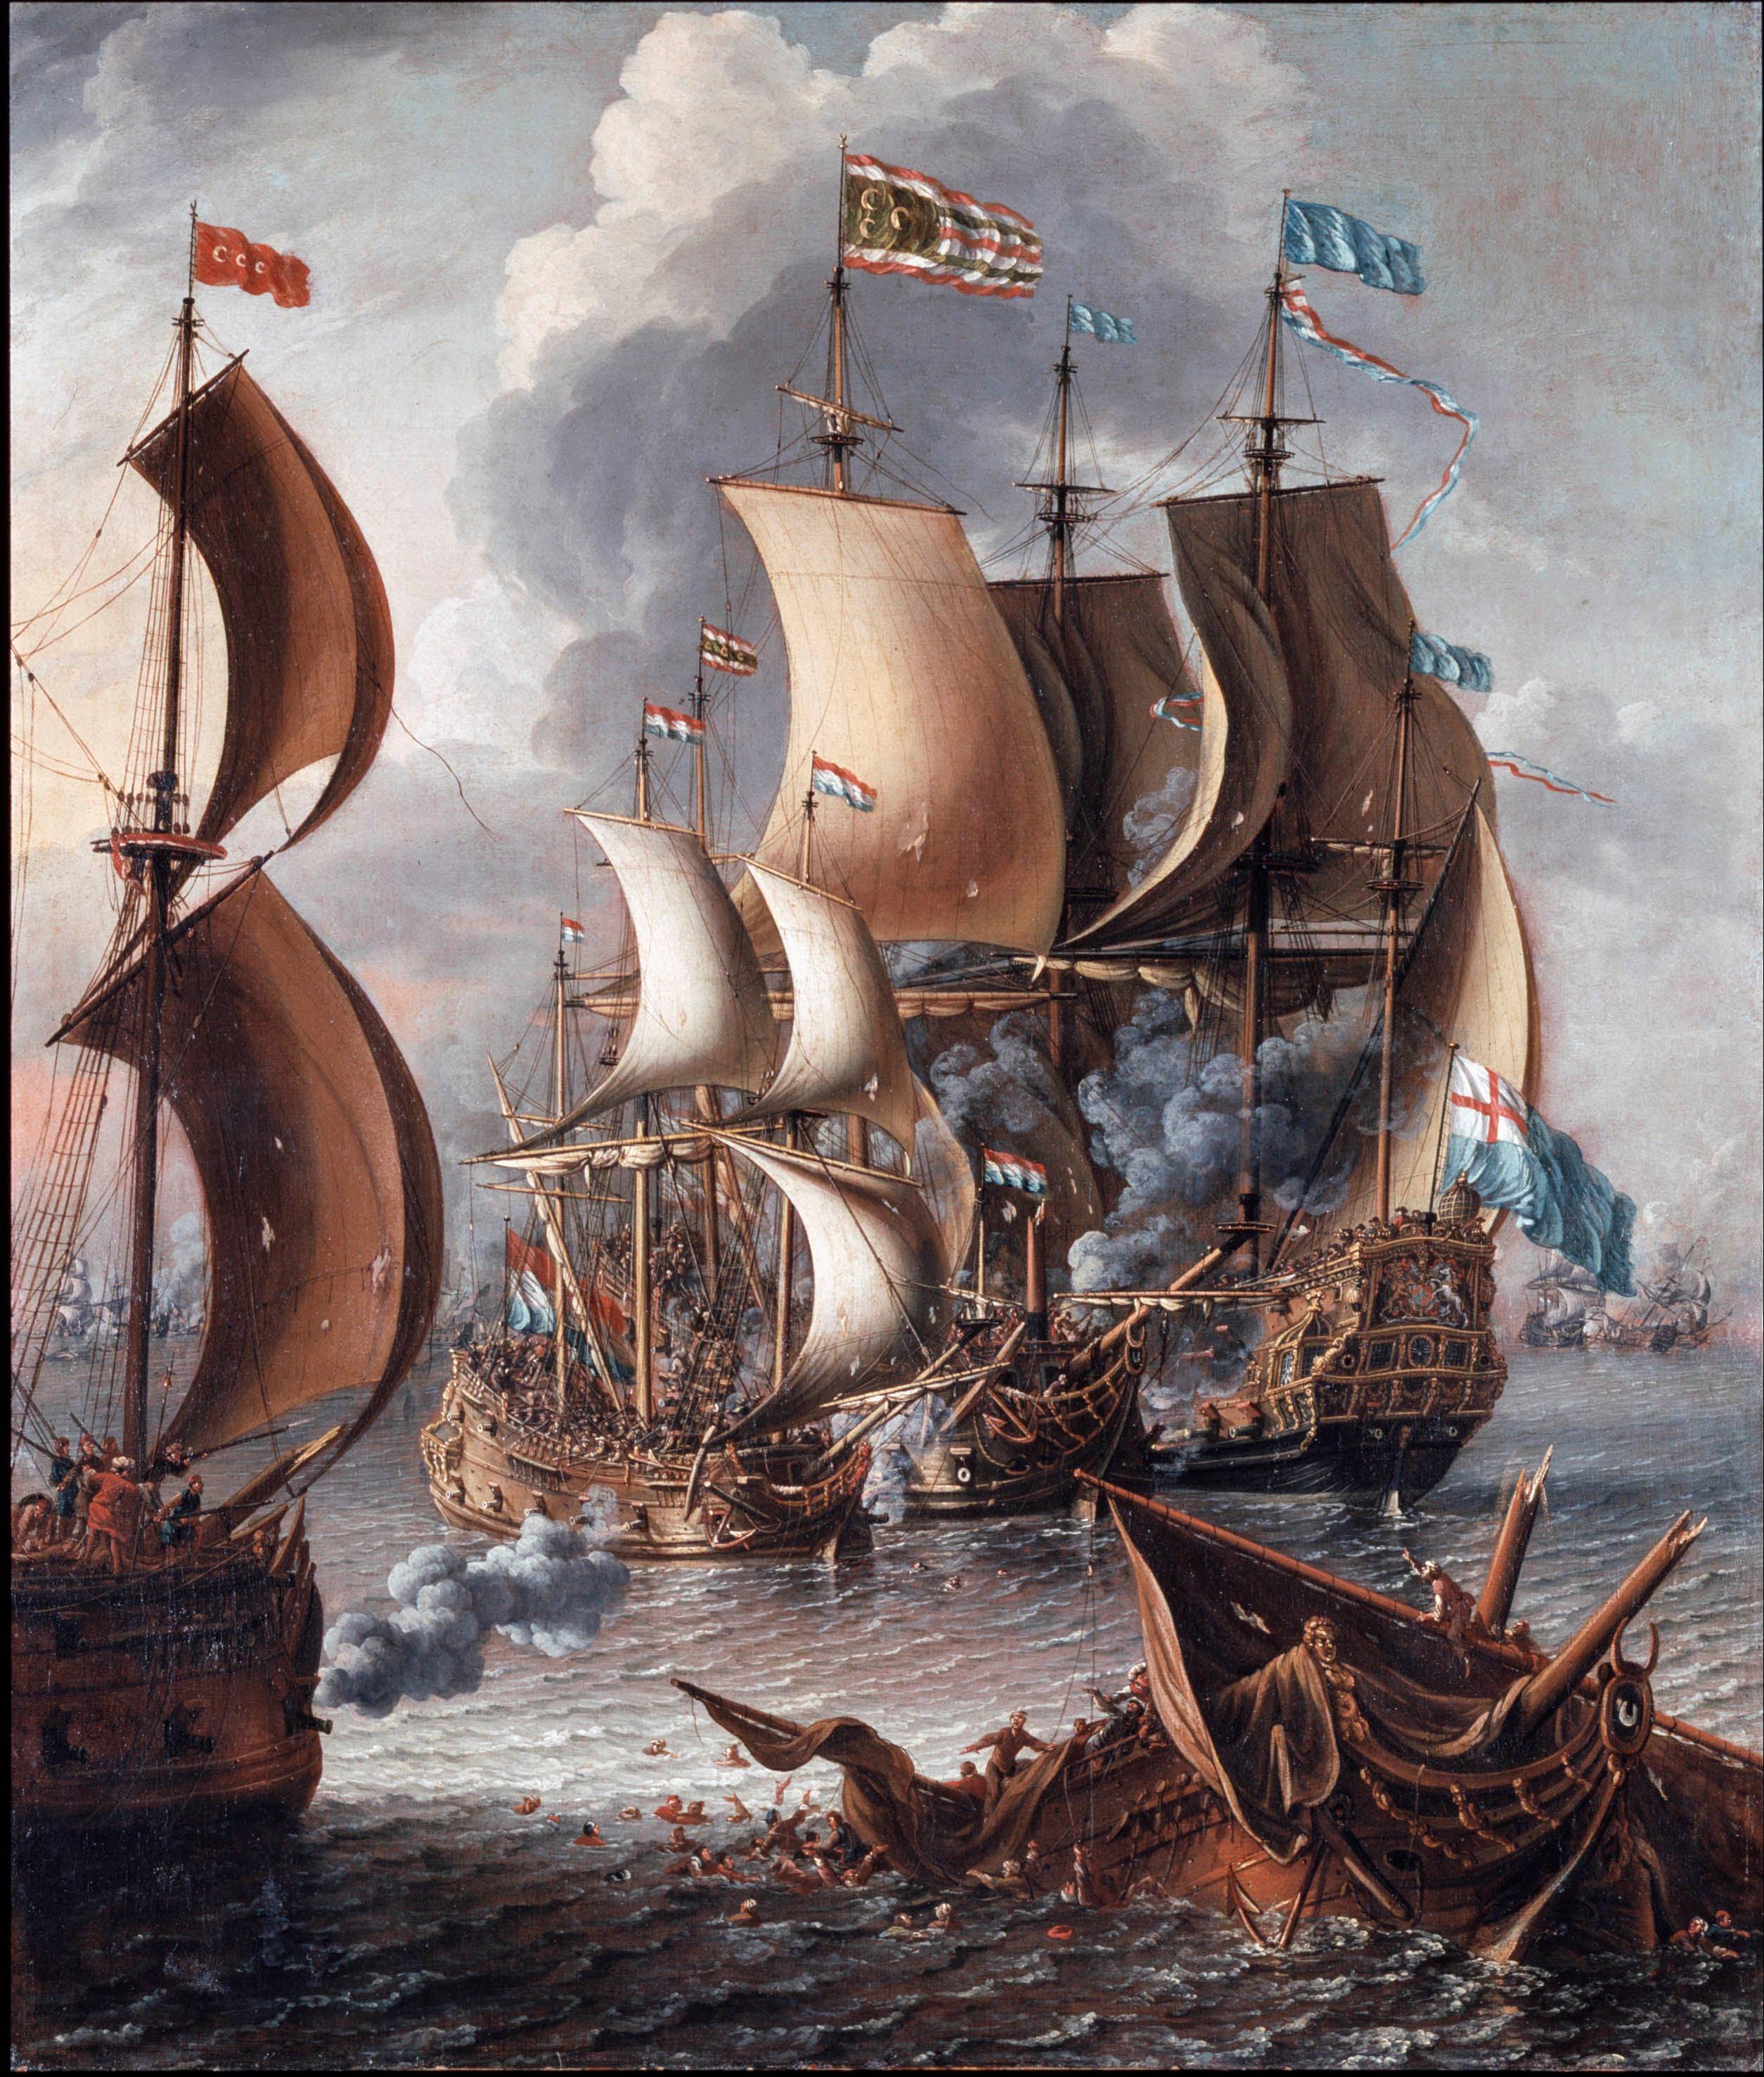 7th sea pirate nations pdf